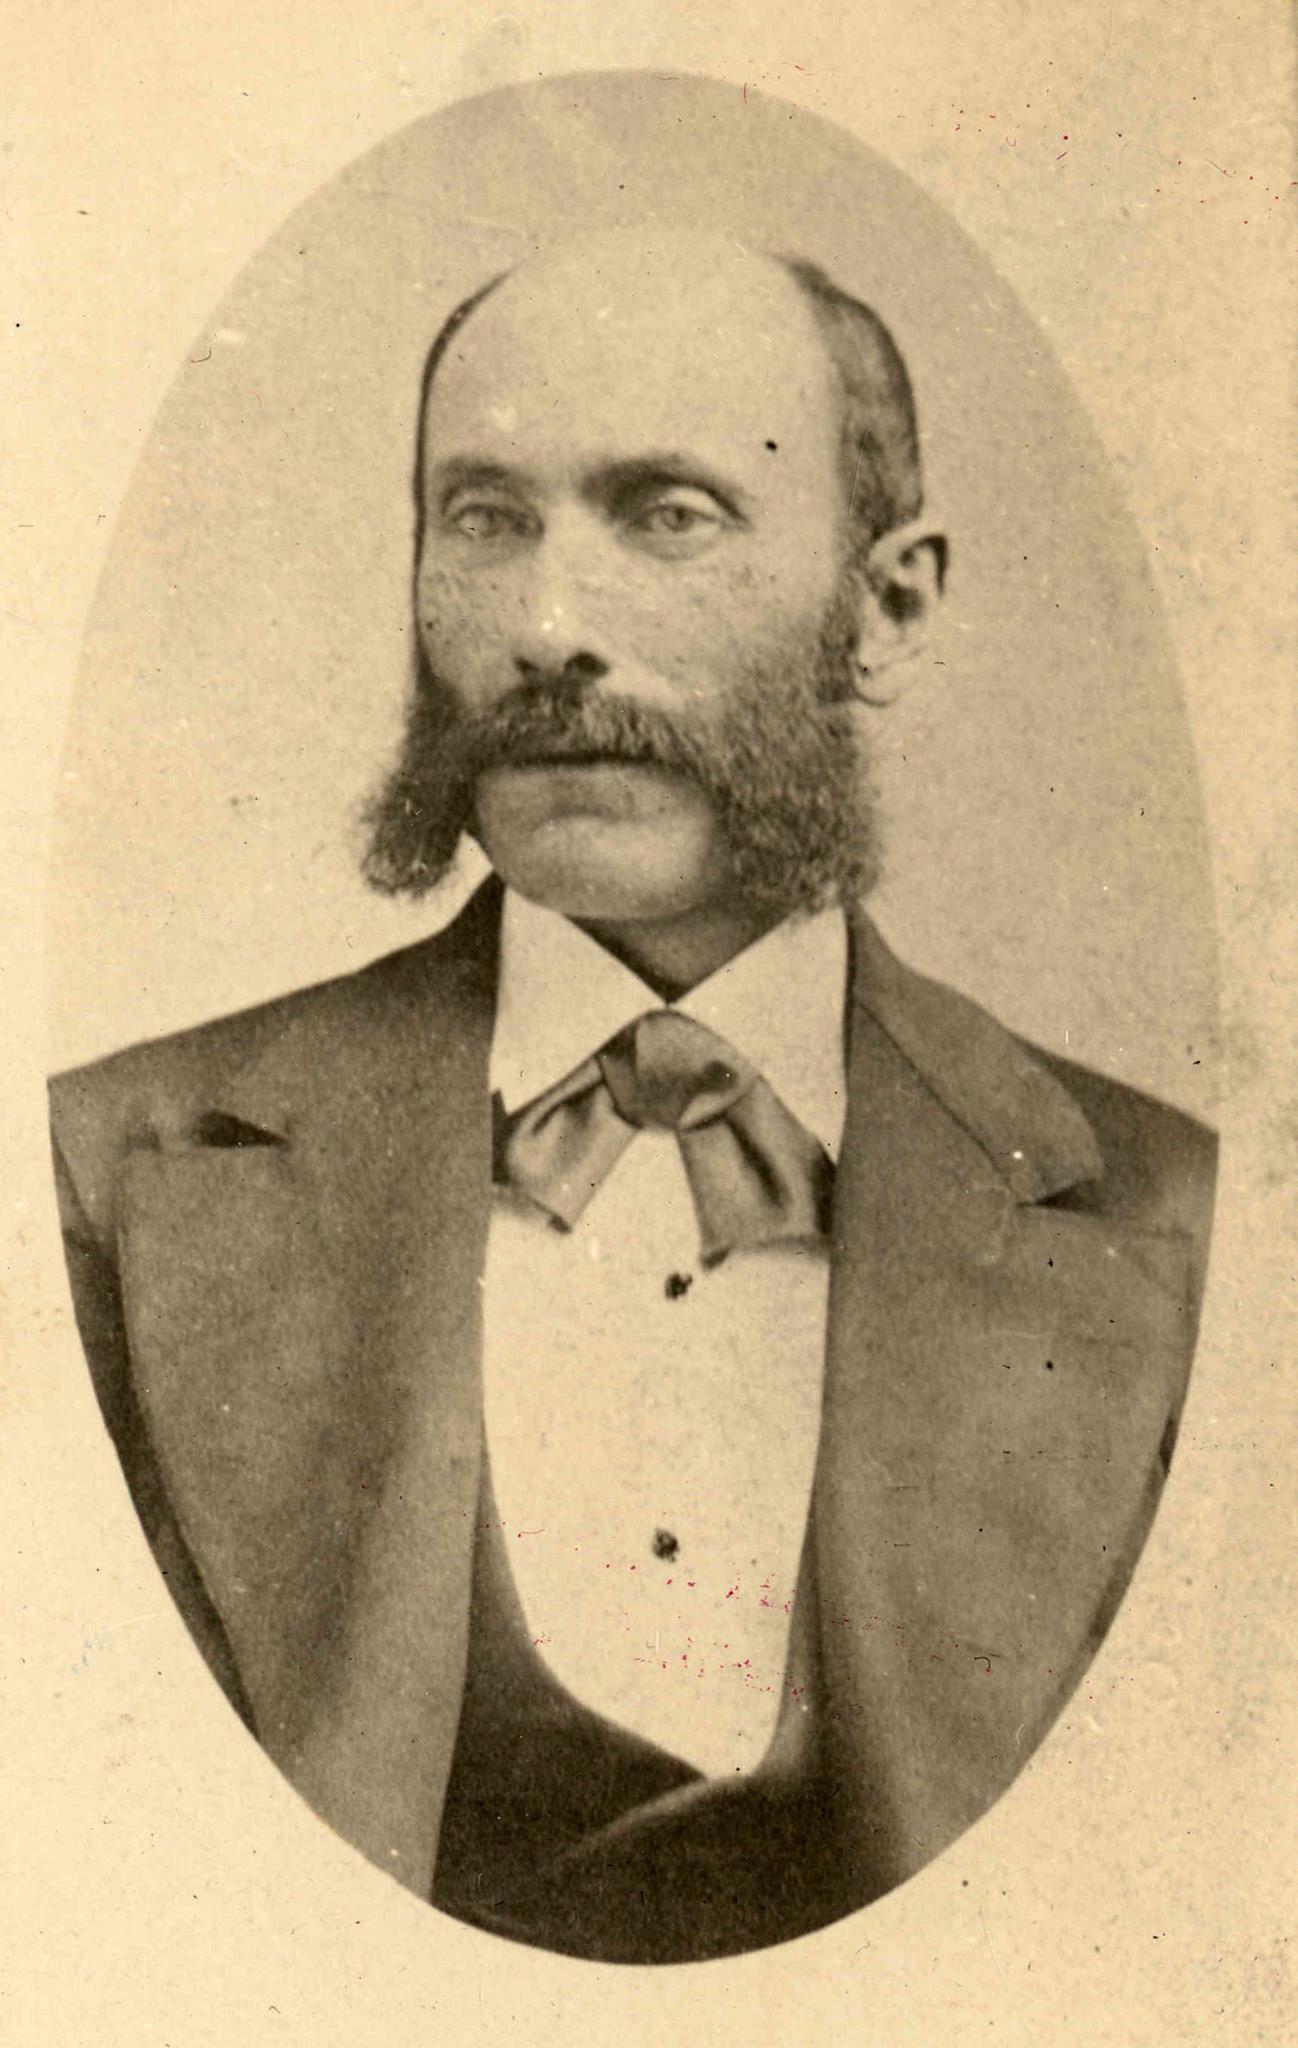 Joshua_Abraham_Norton_in_1851.jpg